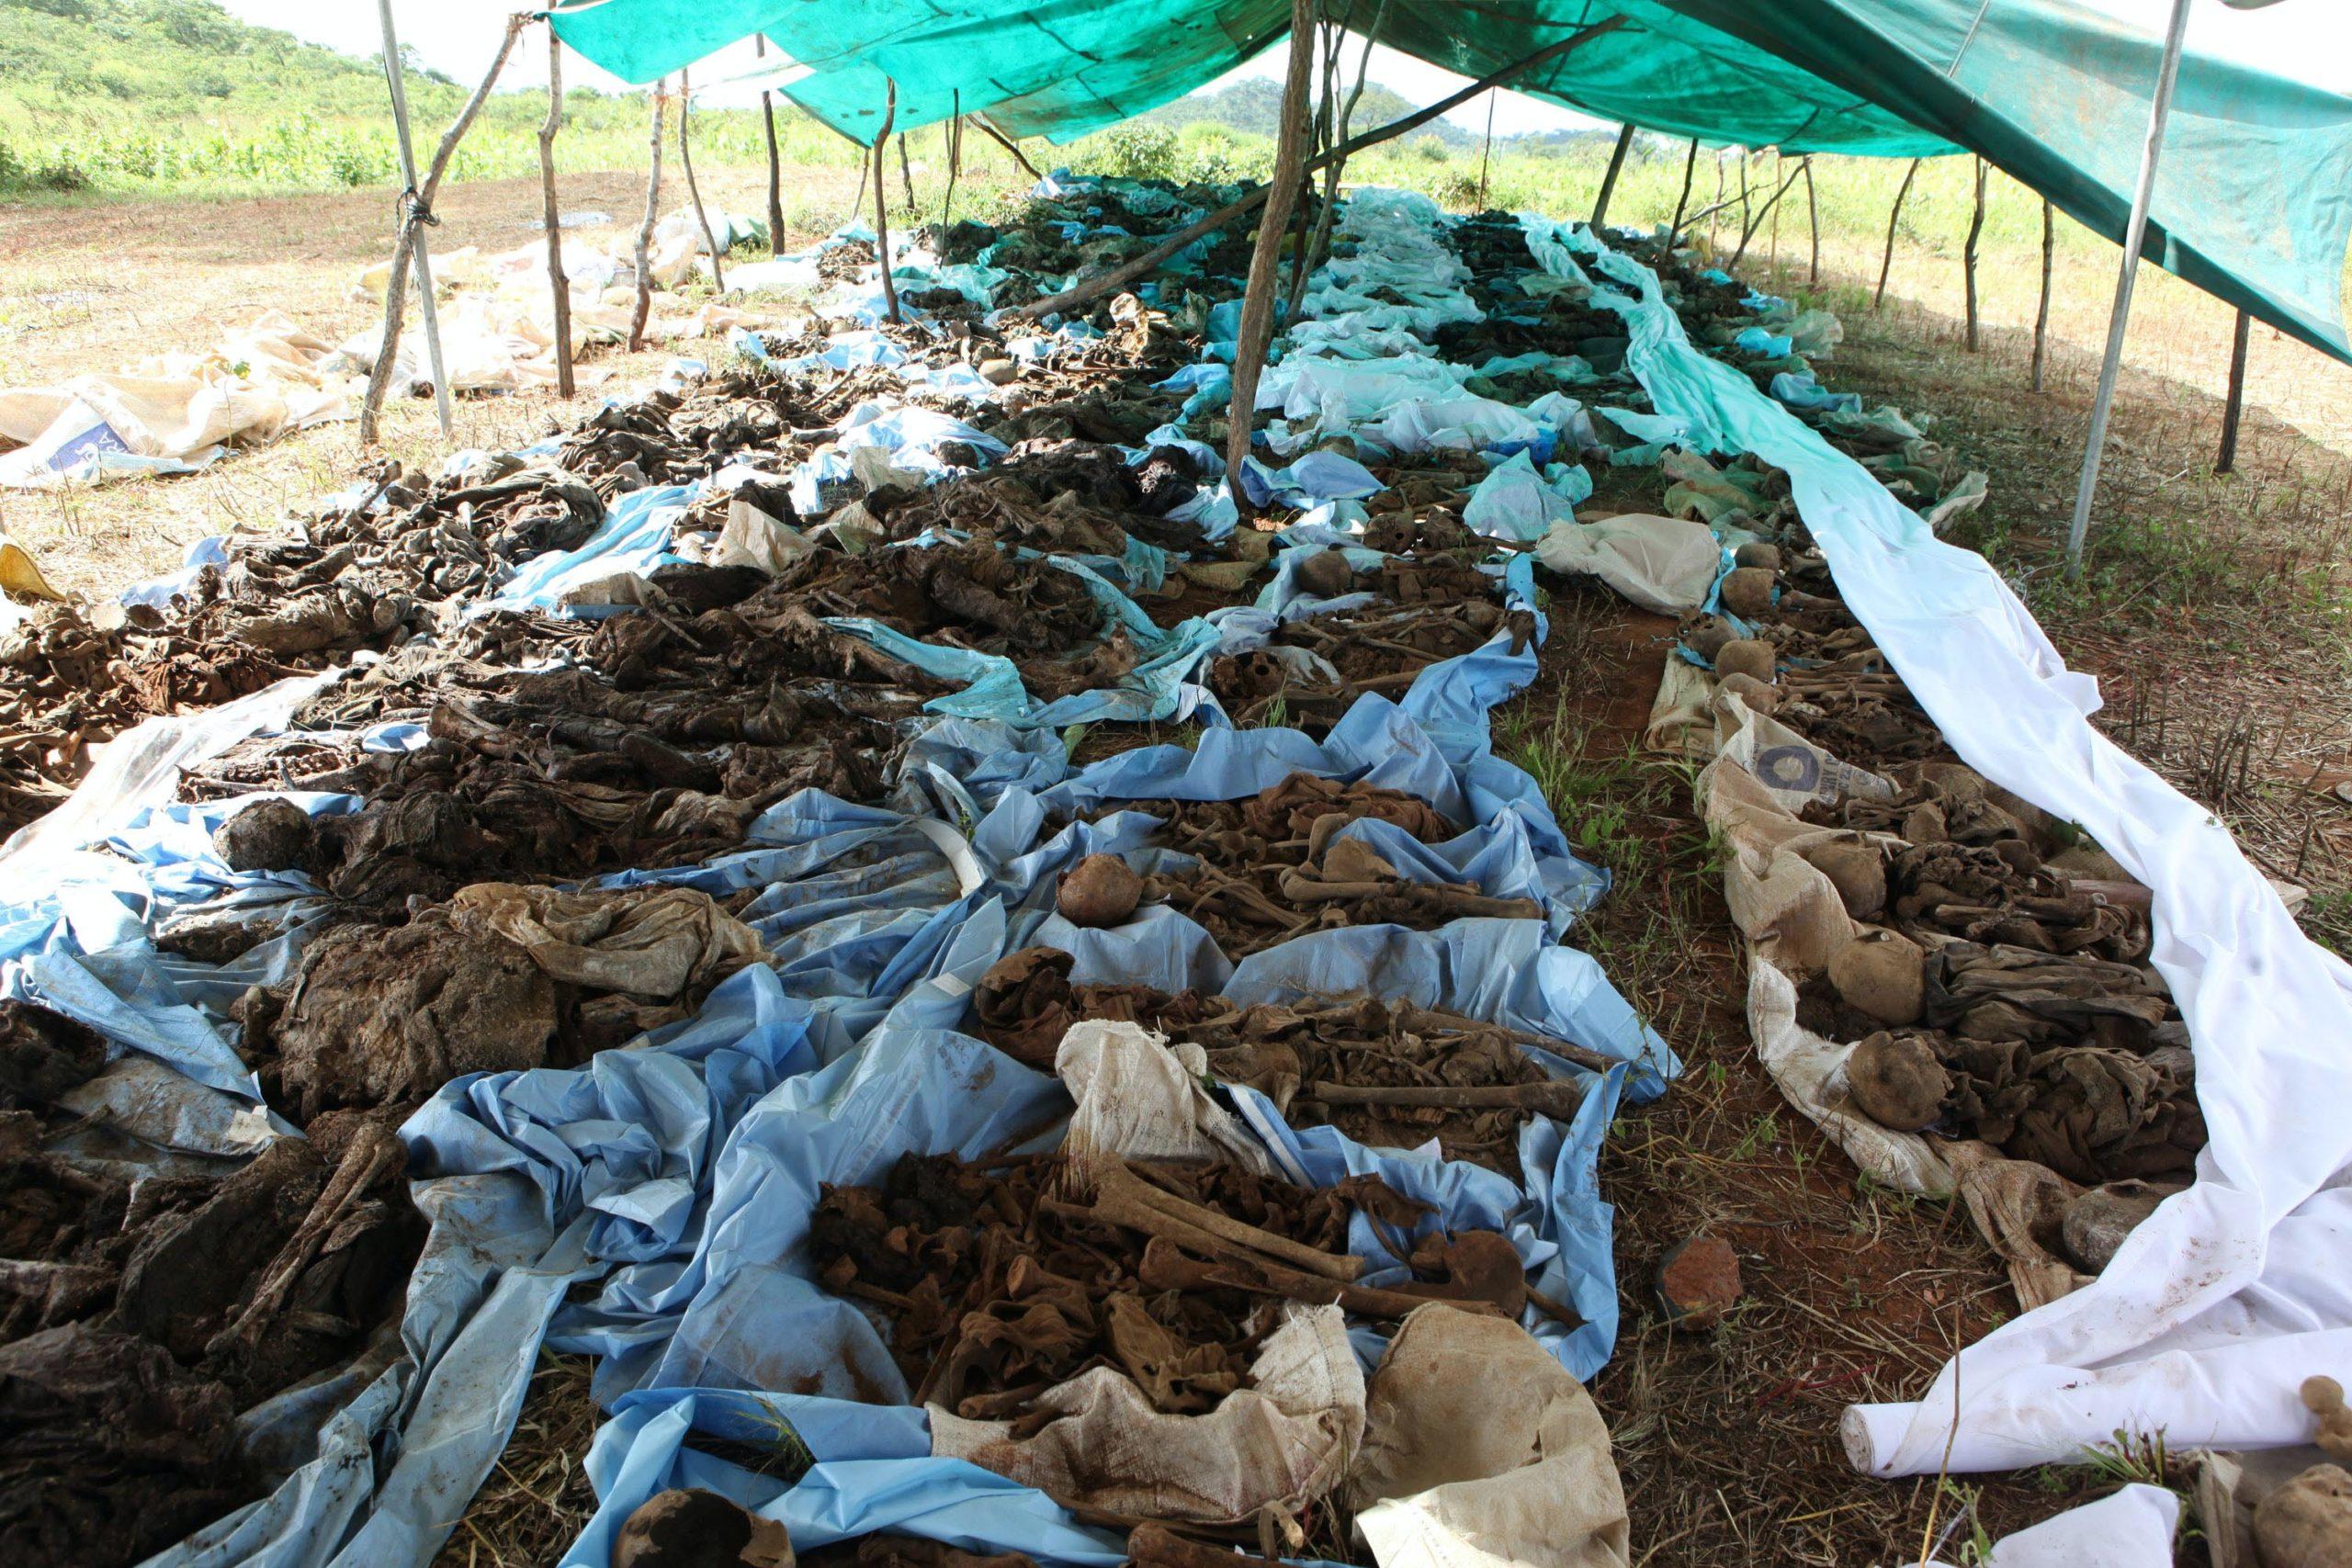 Hundreds of skeletons found in Zimbabwean mineshafts